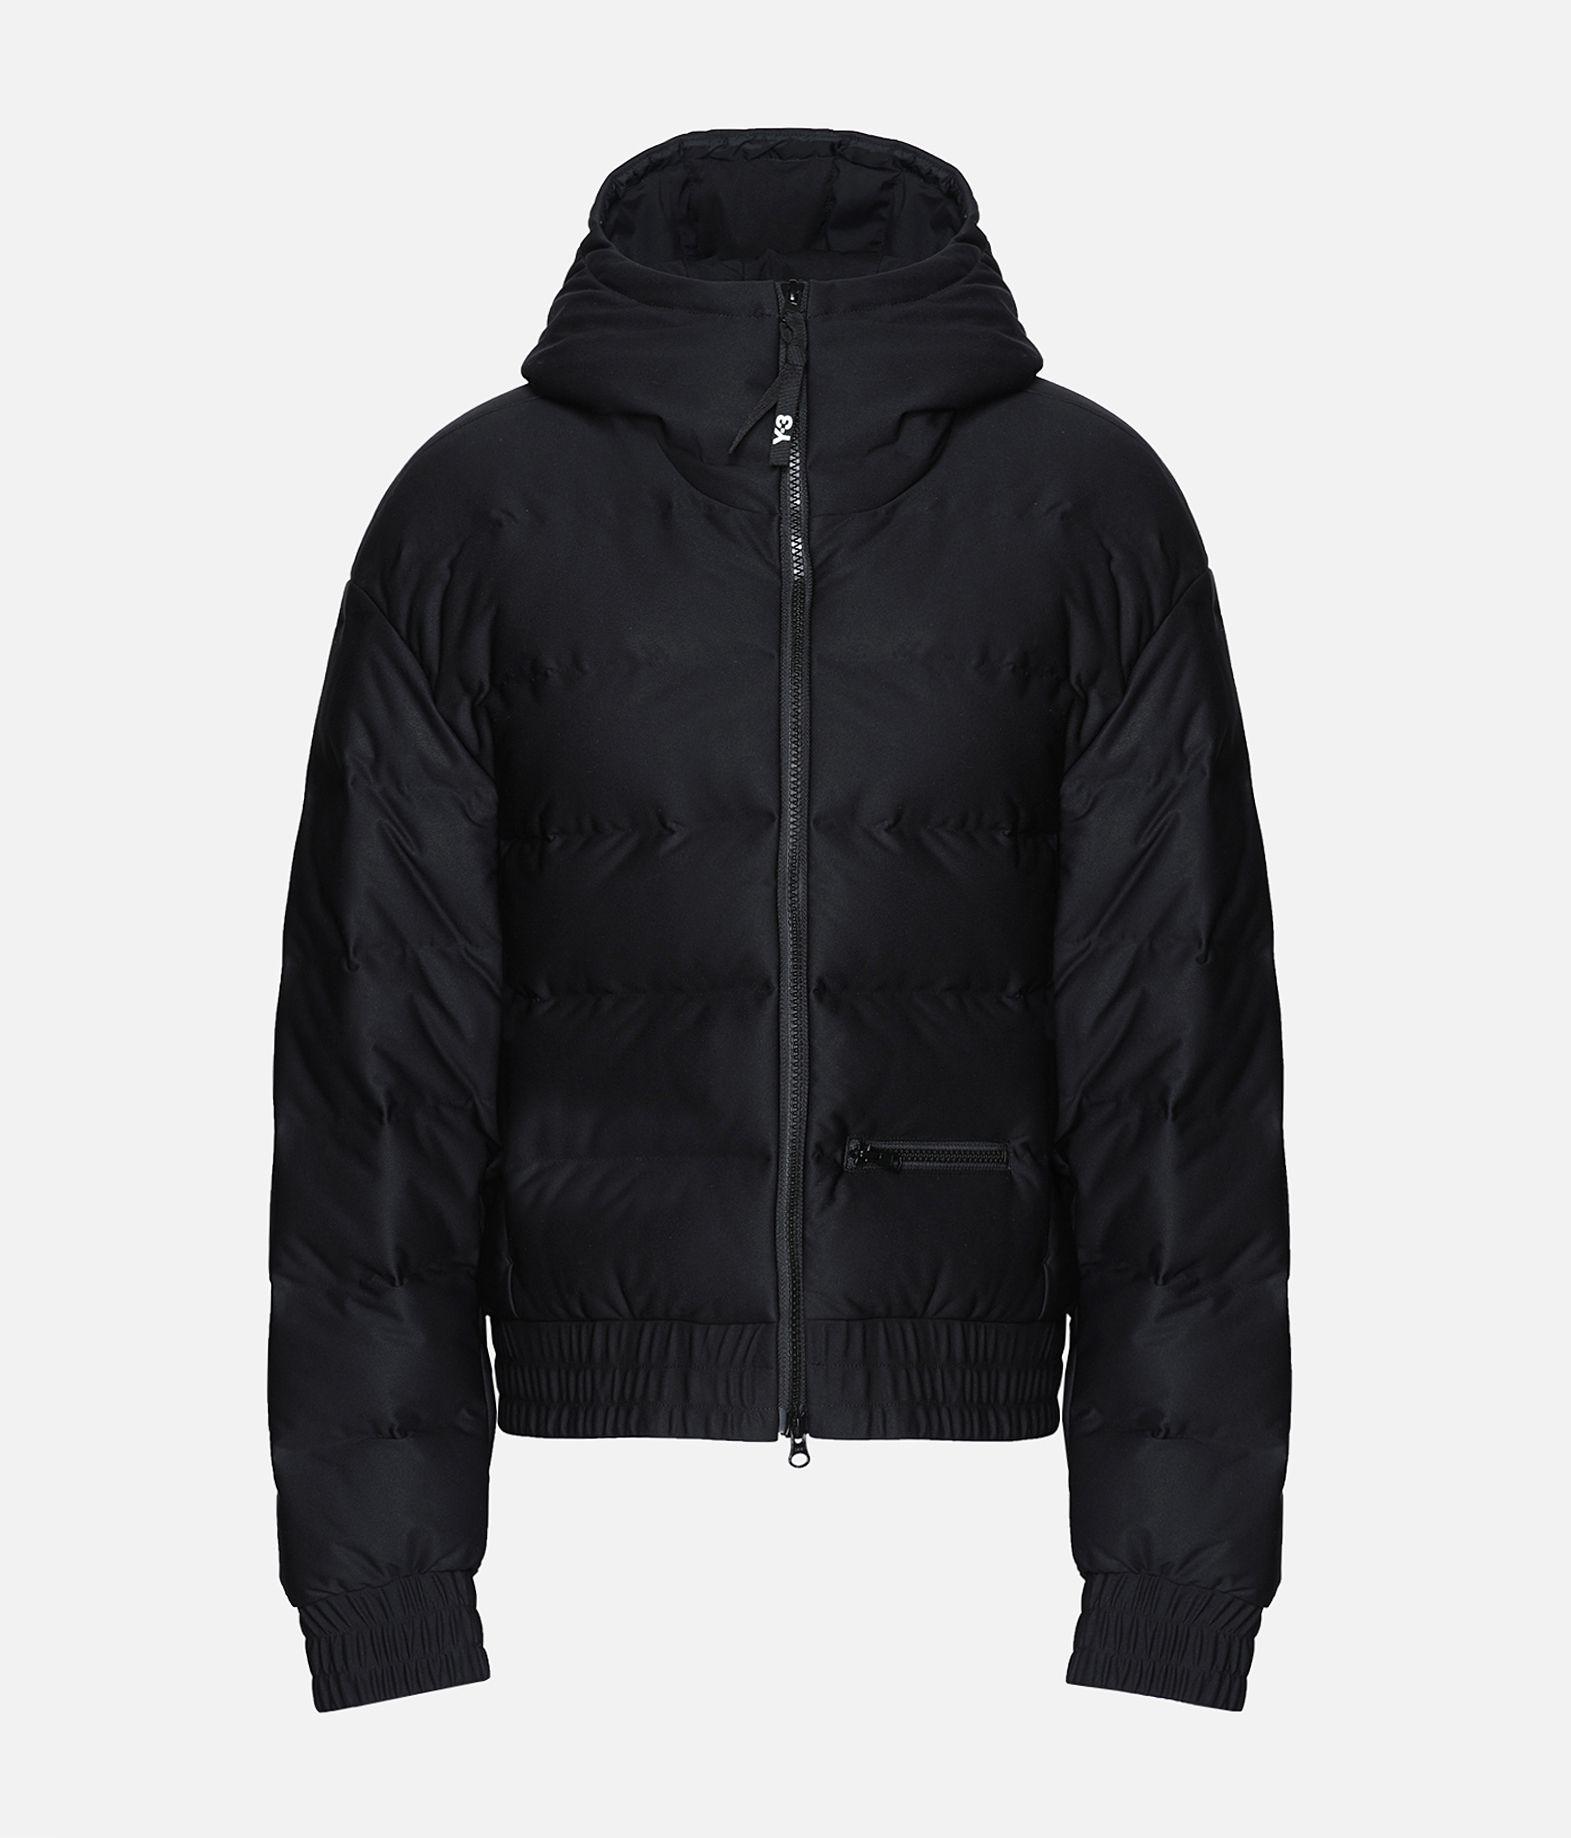 Y-3 Y-3 Seamless Down Hooded Jacket Jacket Woman f